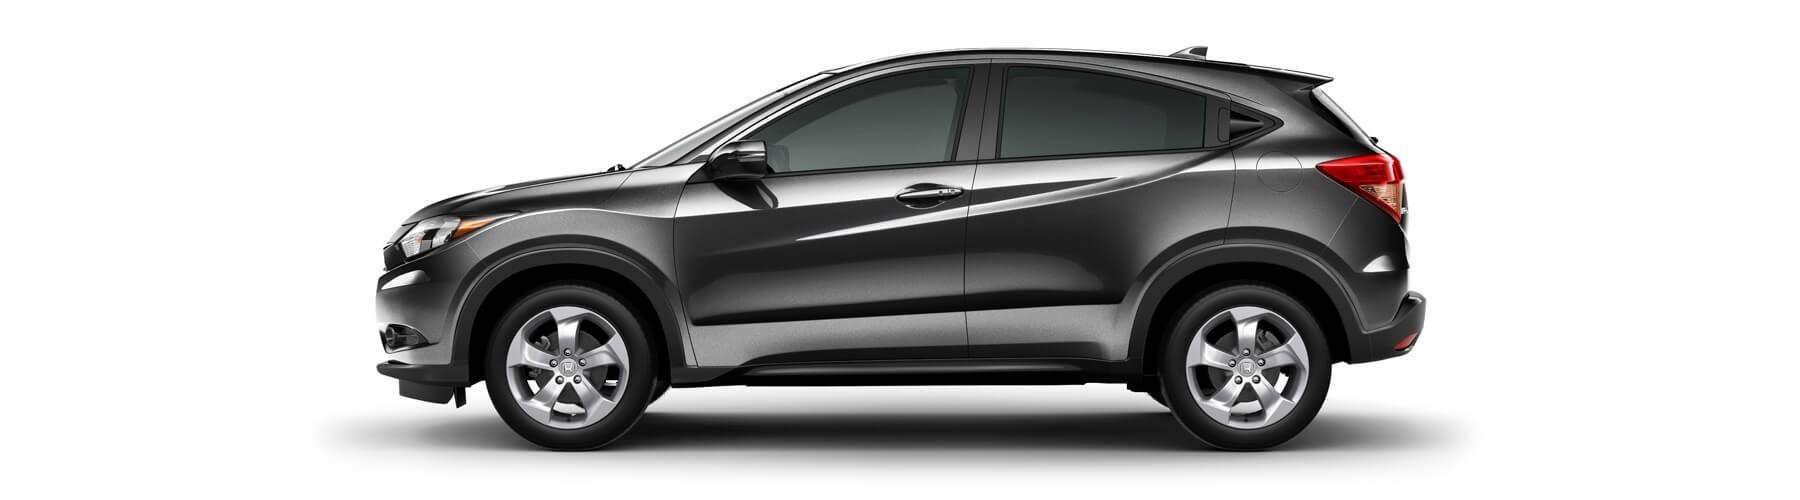 2018 Honda HR-V Side Profile